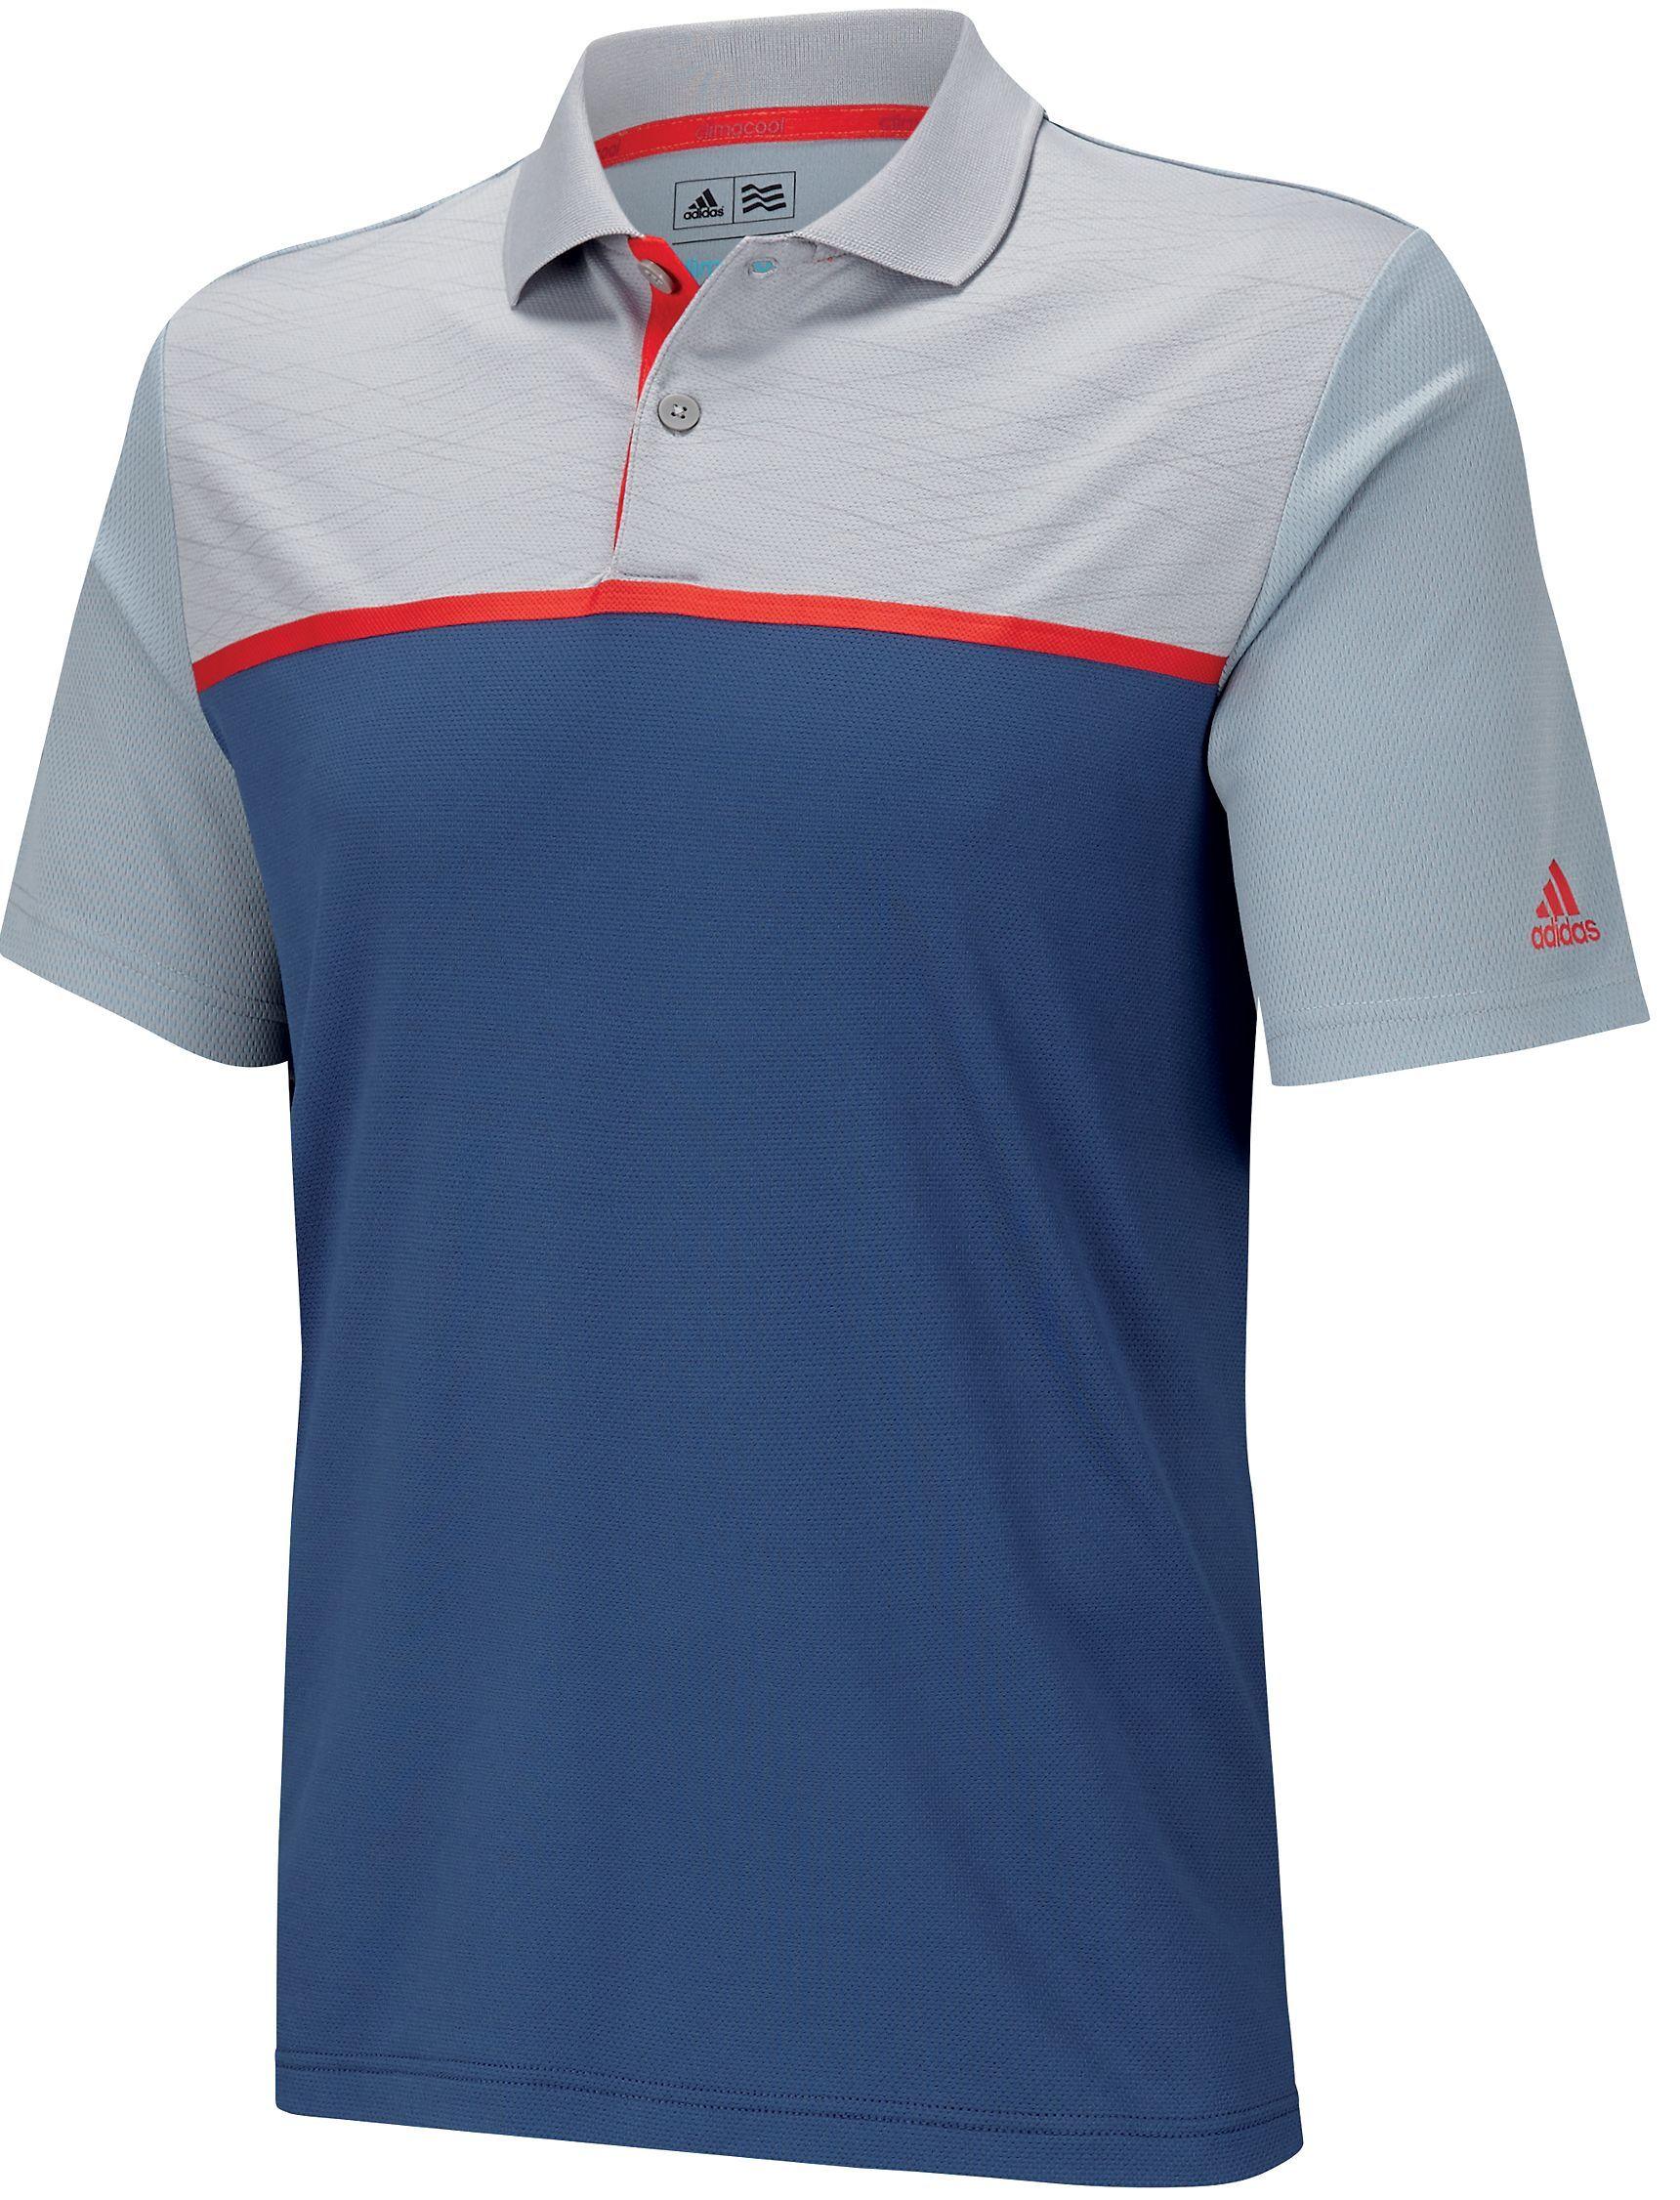 27++ Best mens golf shirts 2018 information